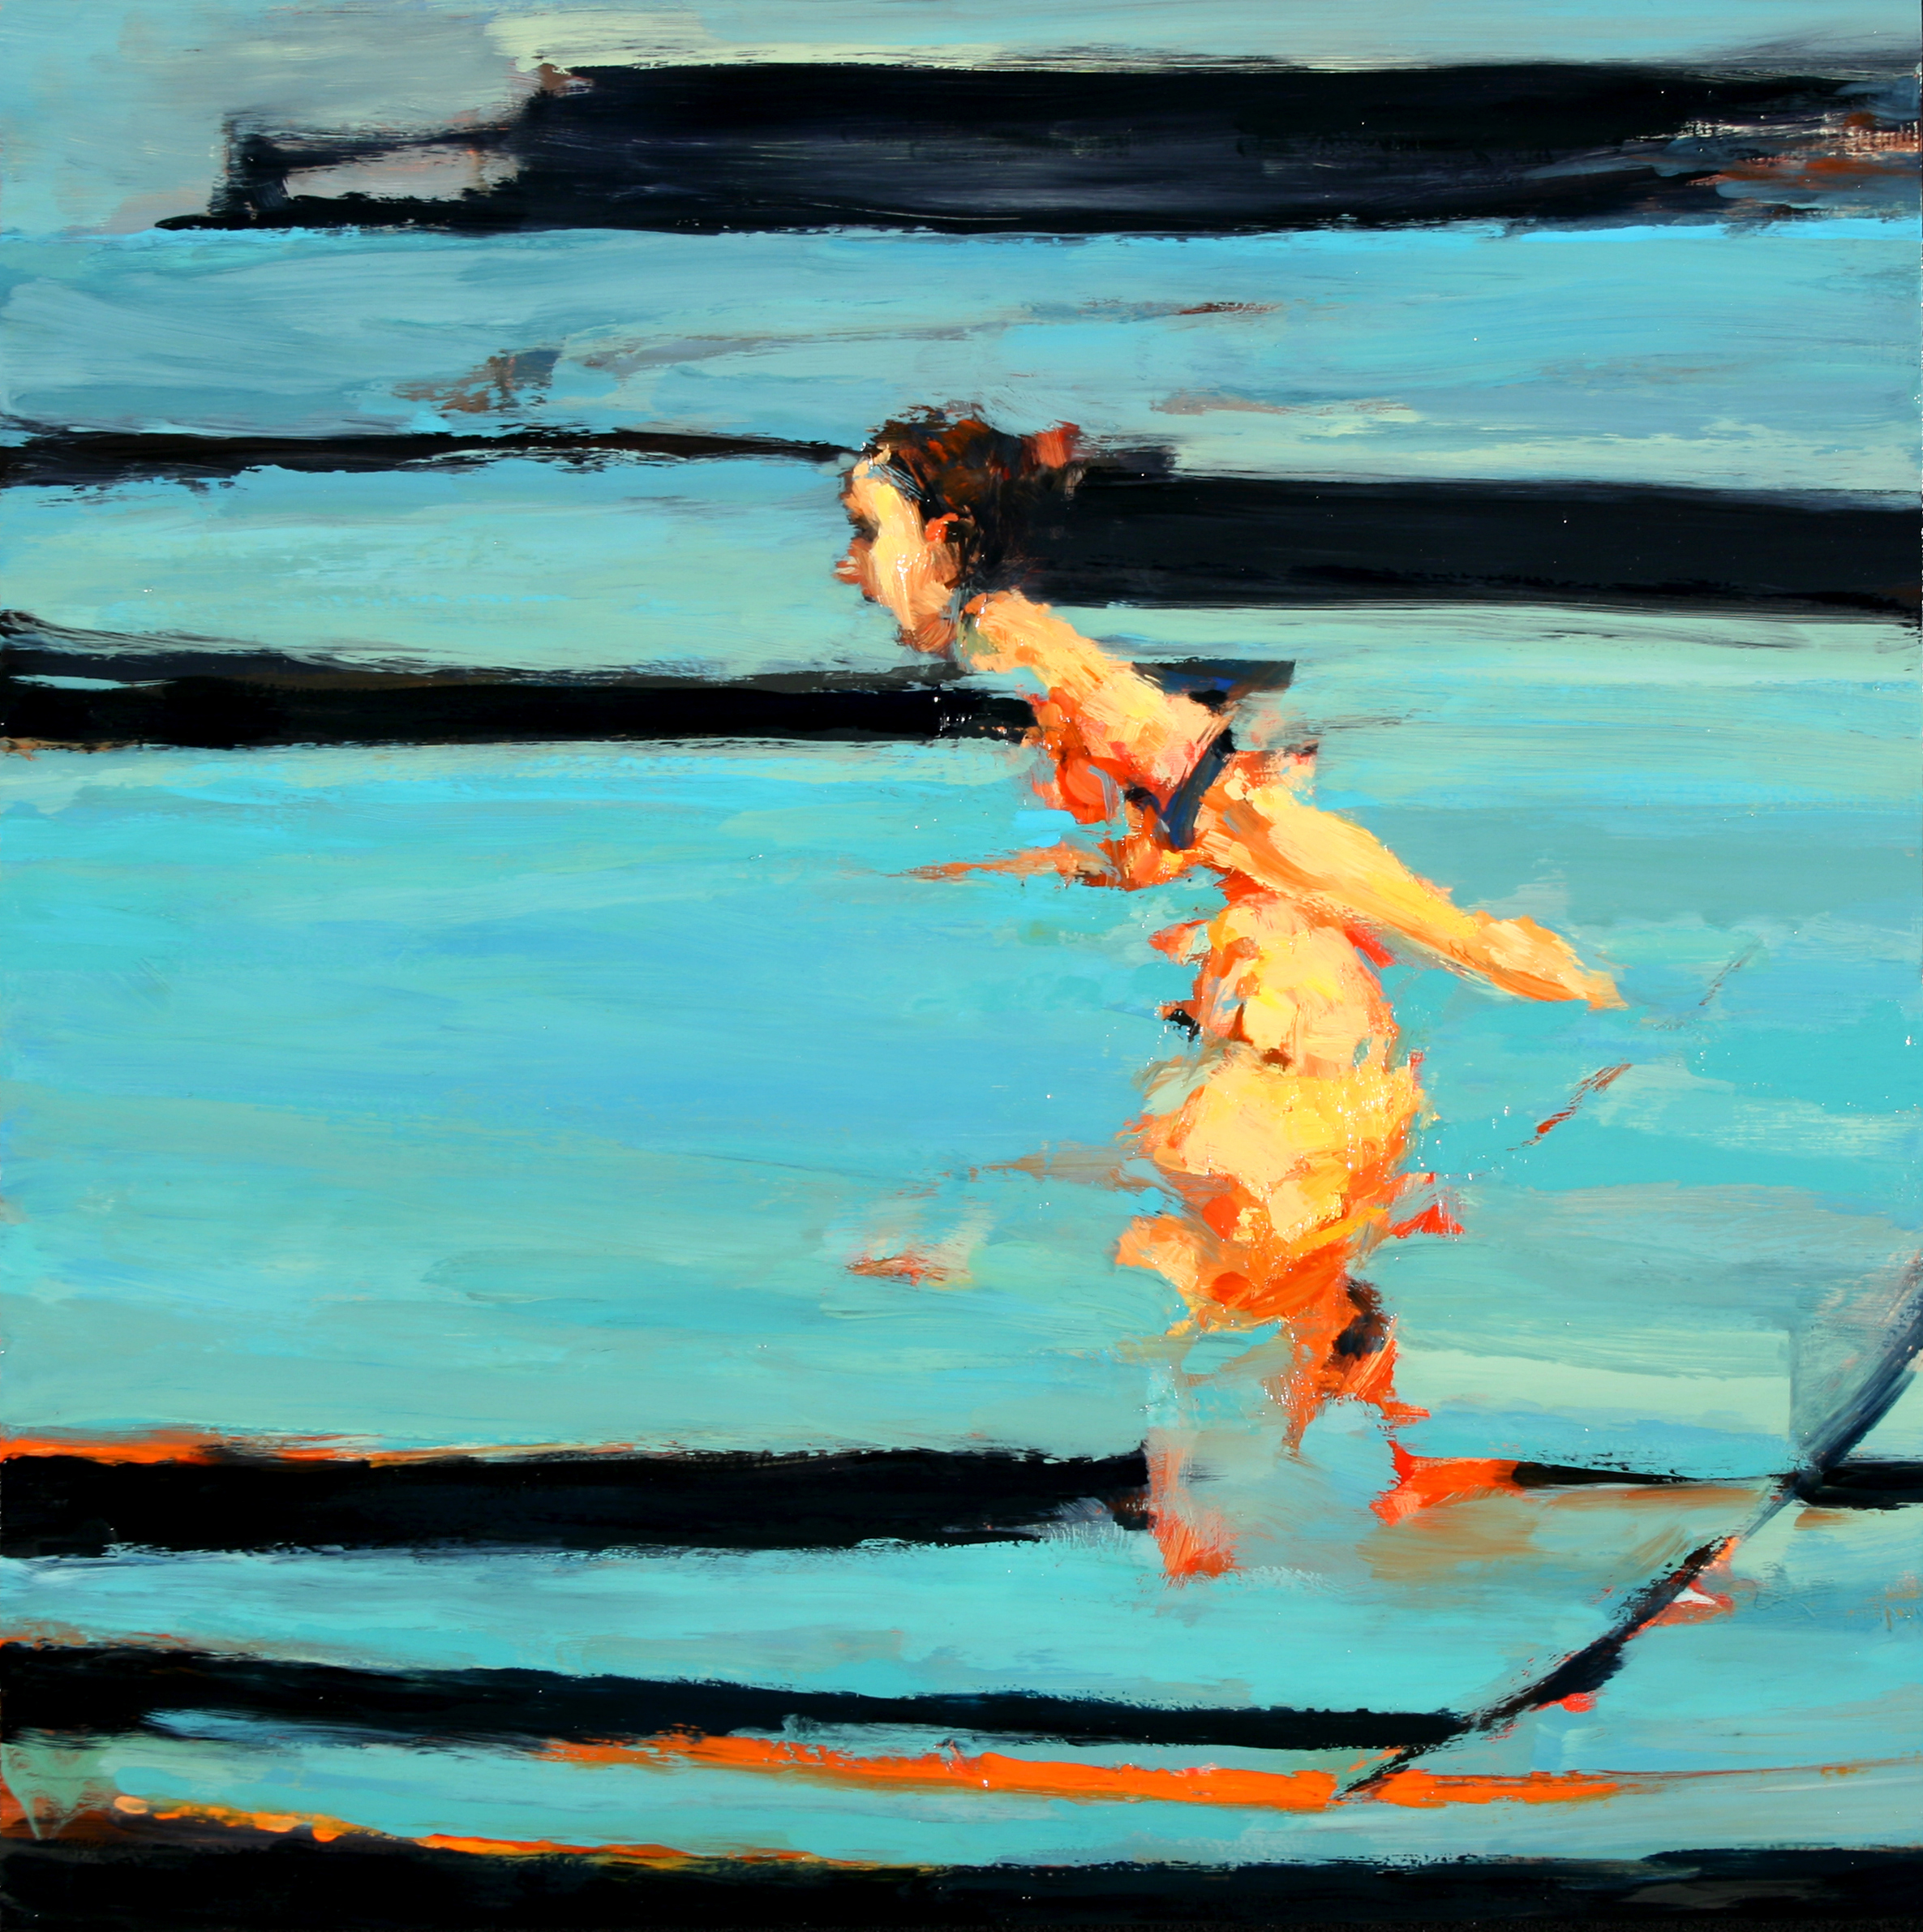 "Untitled, oil on board, 16"" x 16"" x 2"", 2008"